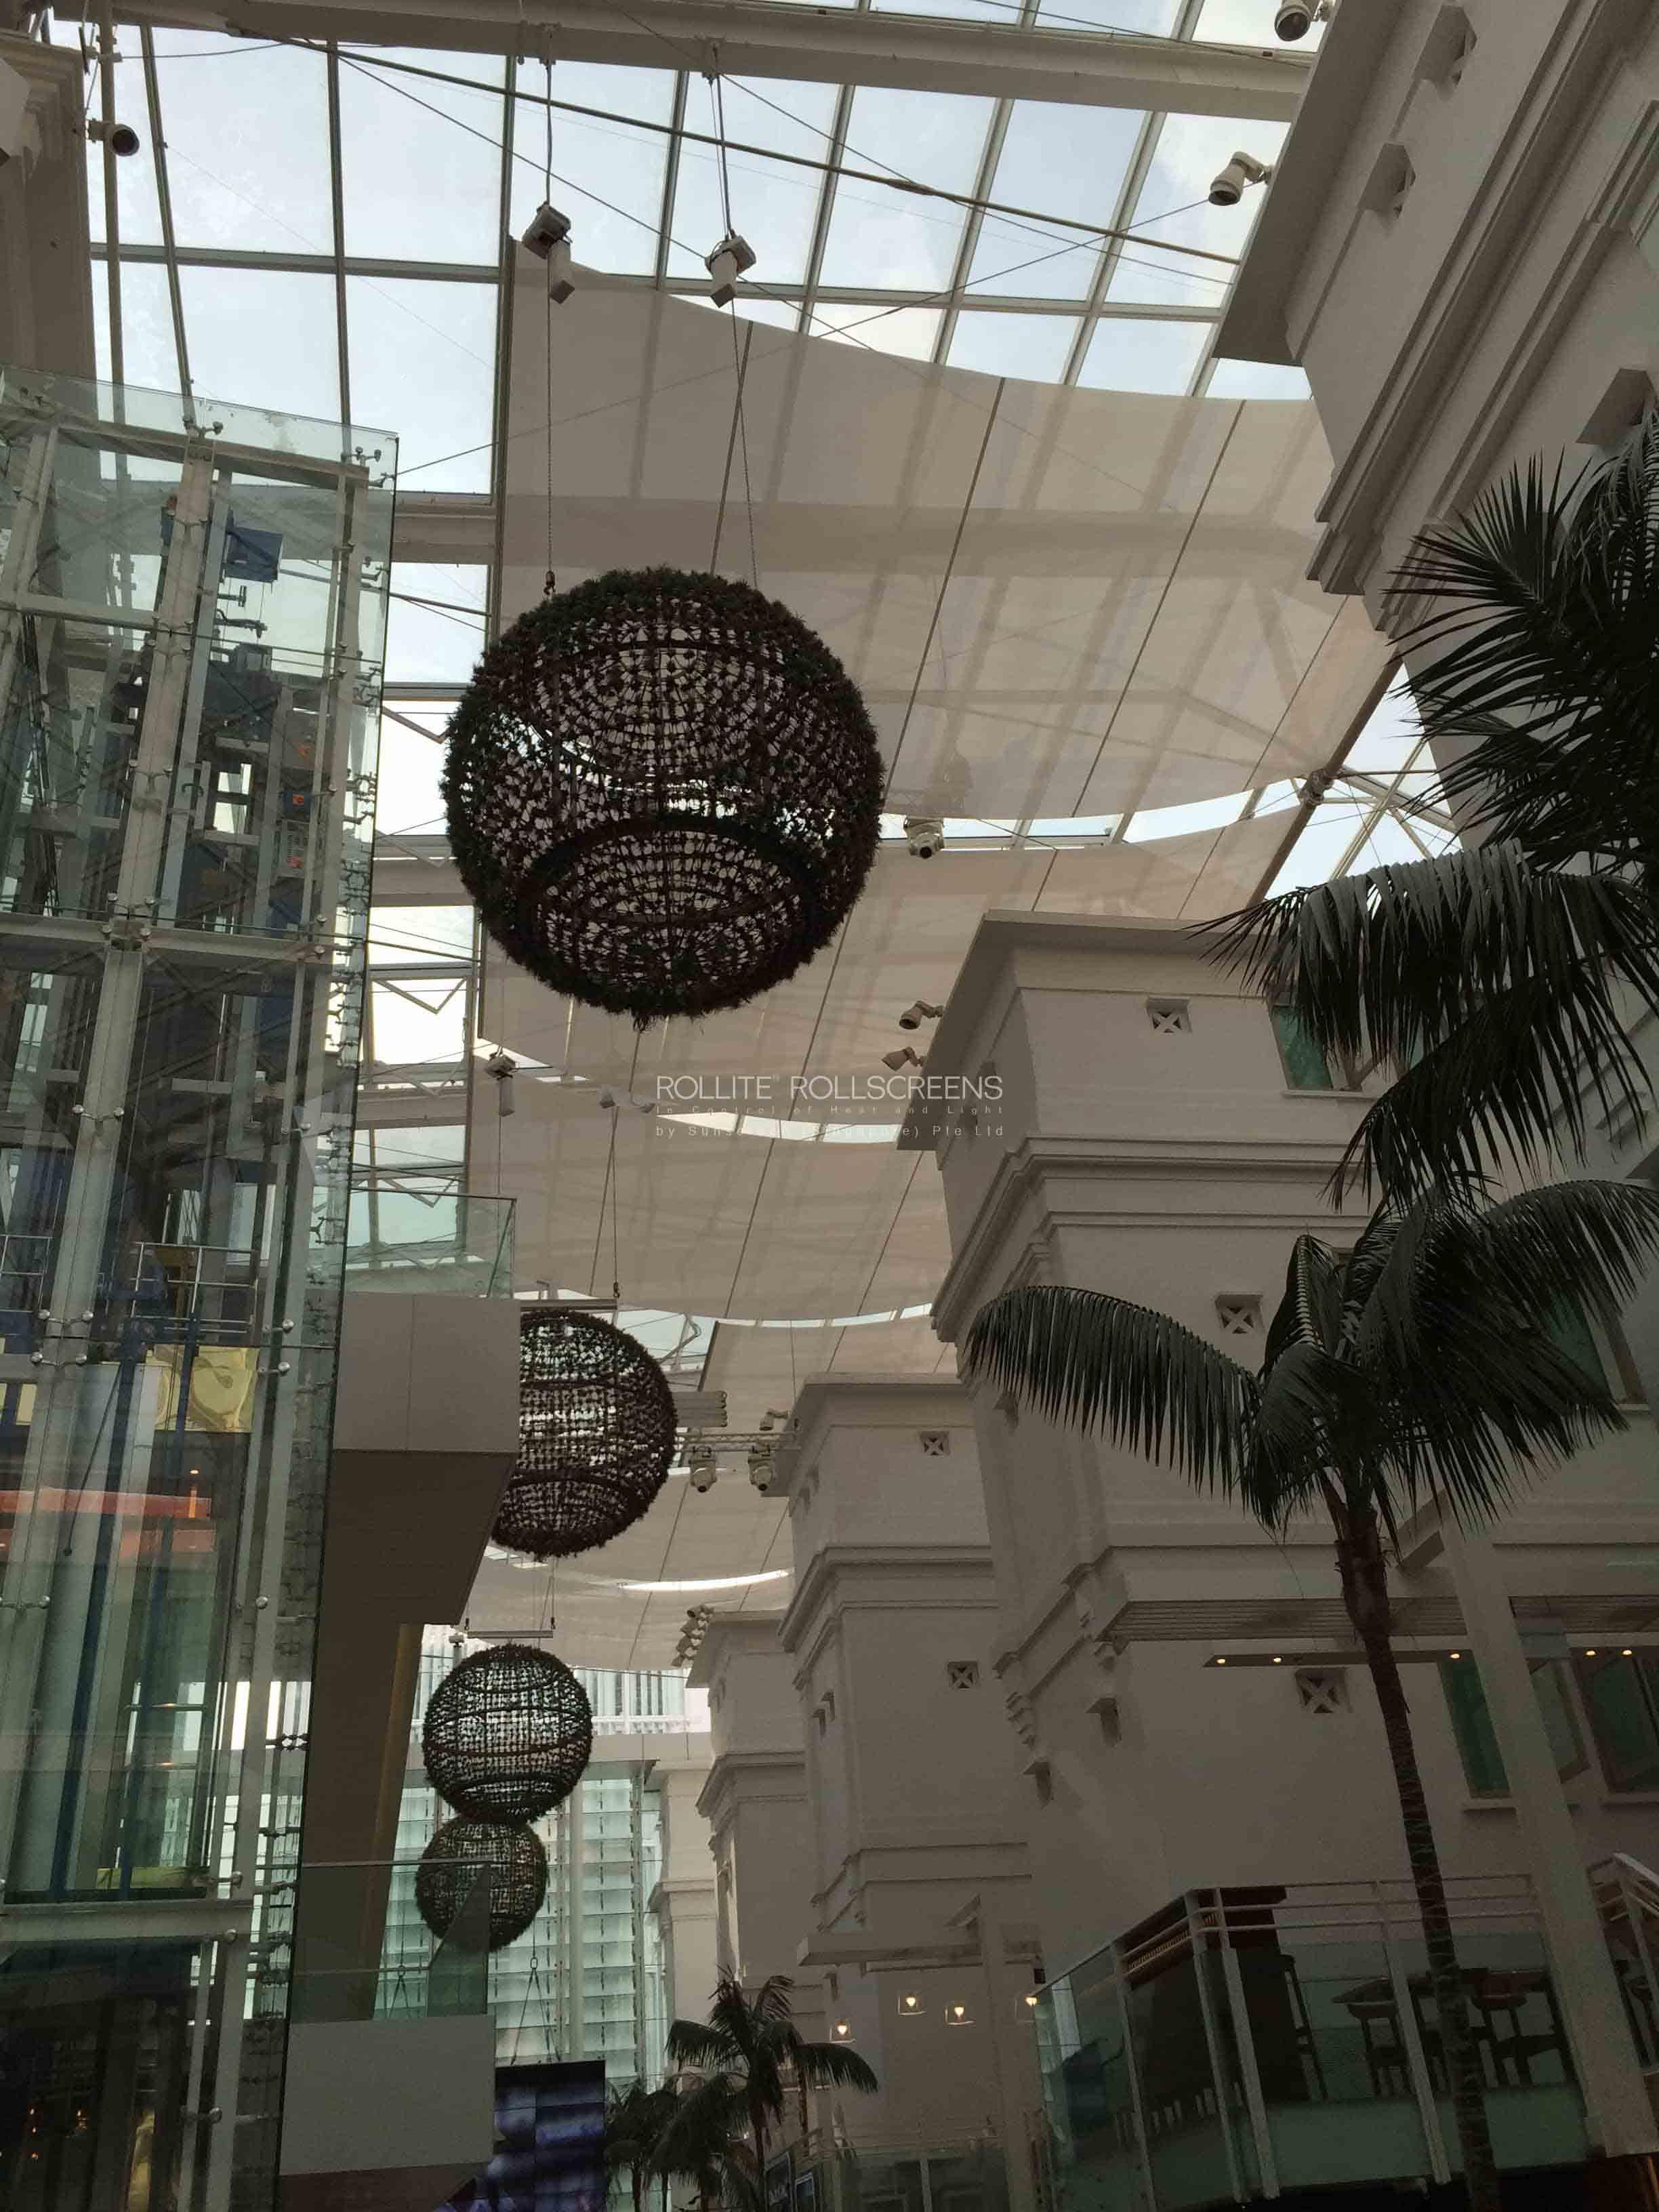 Sunscreen-Singapore_Rollite-Skylight-14